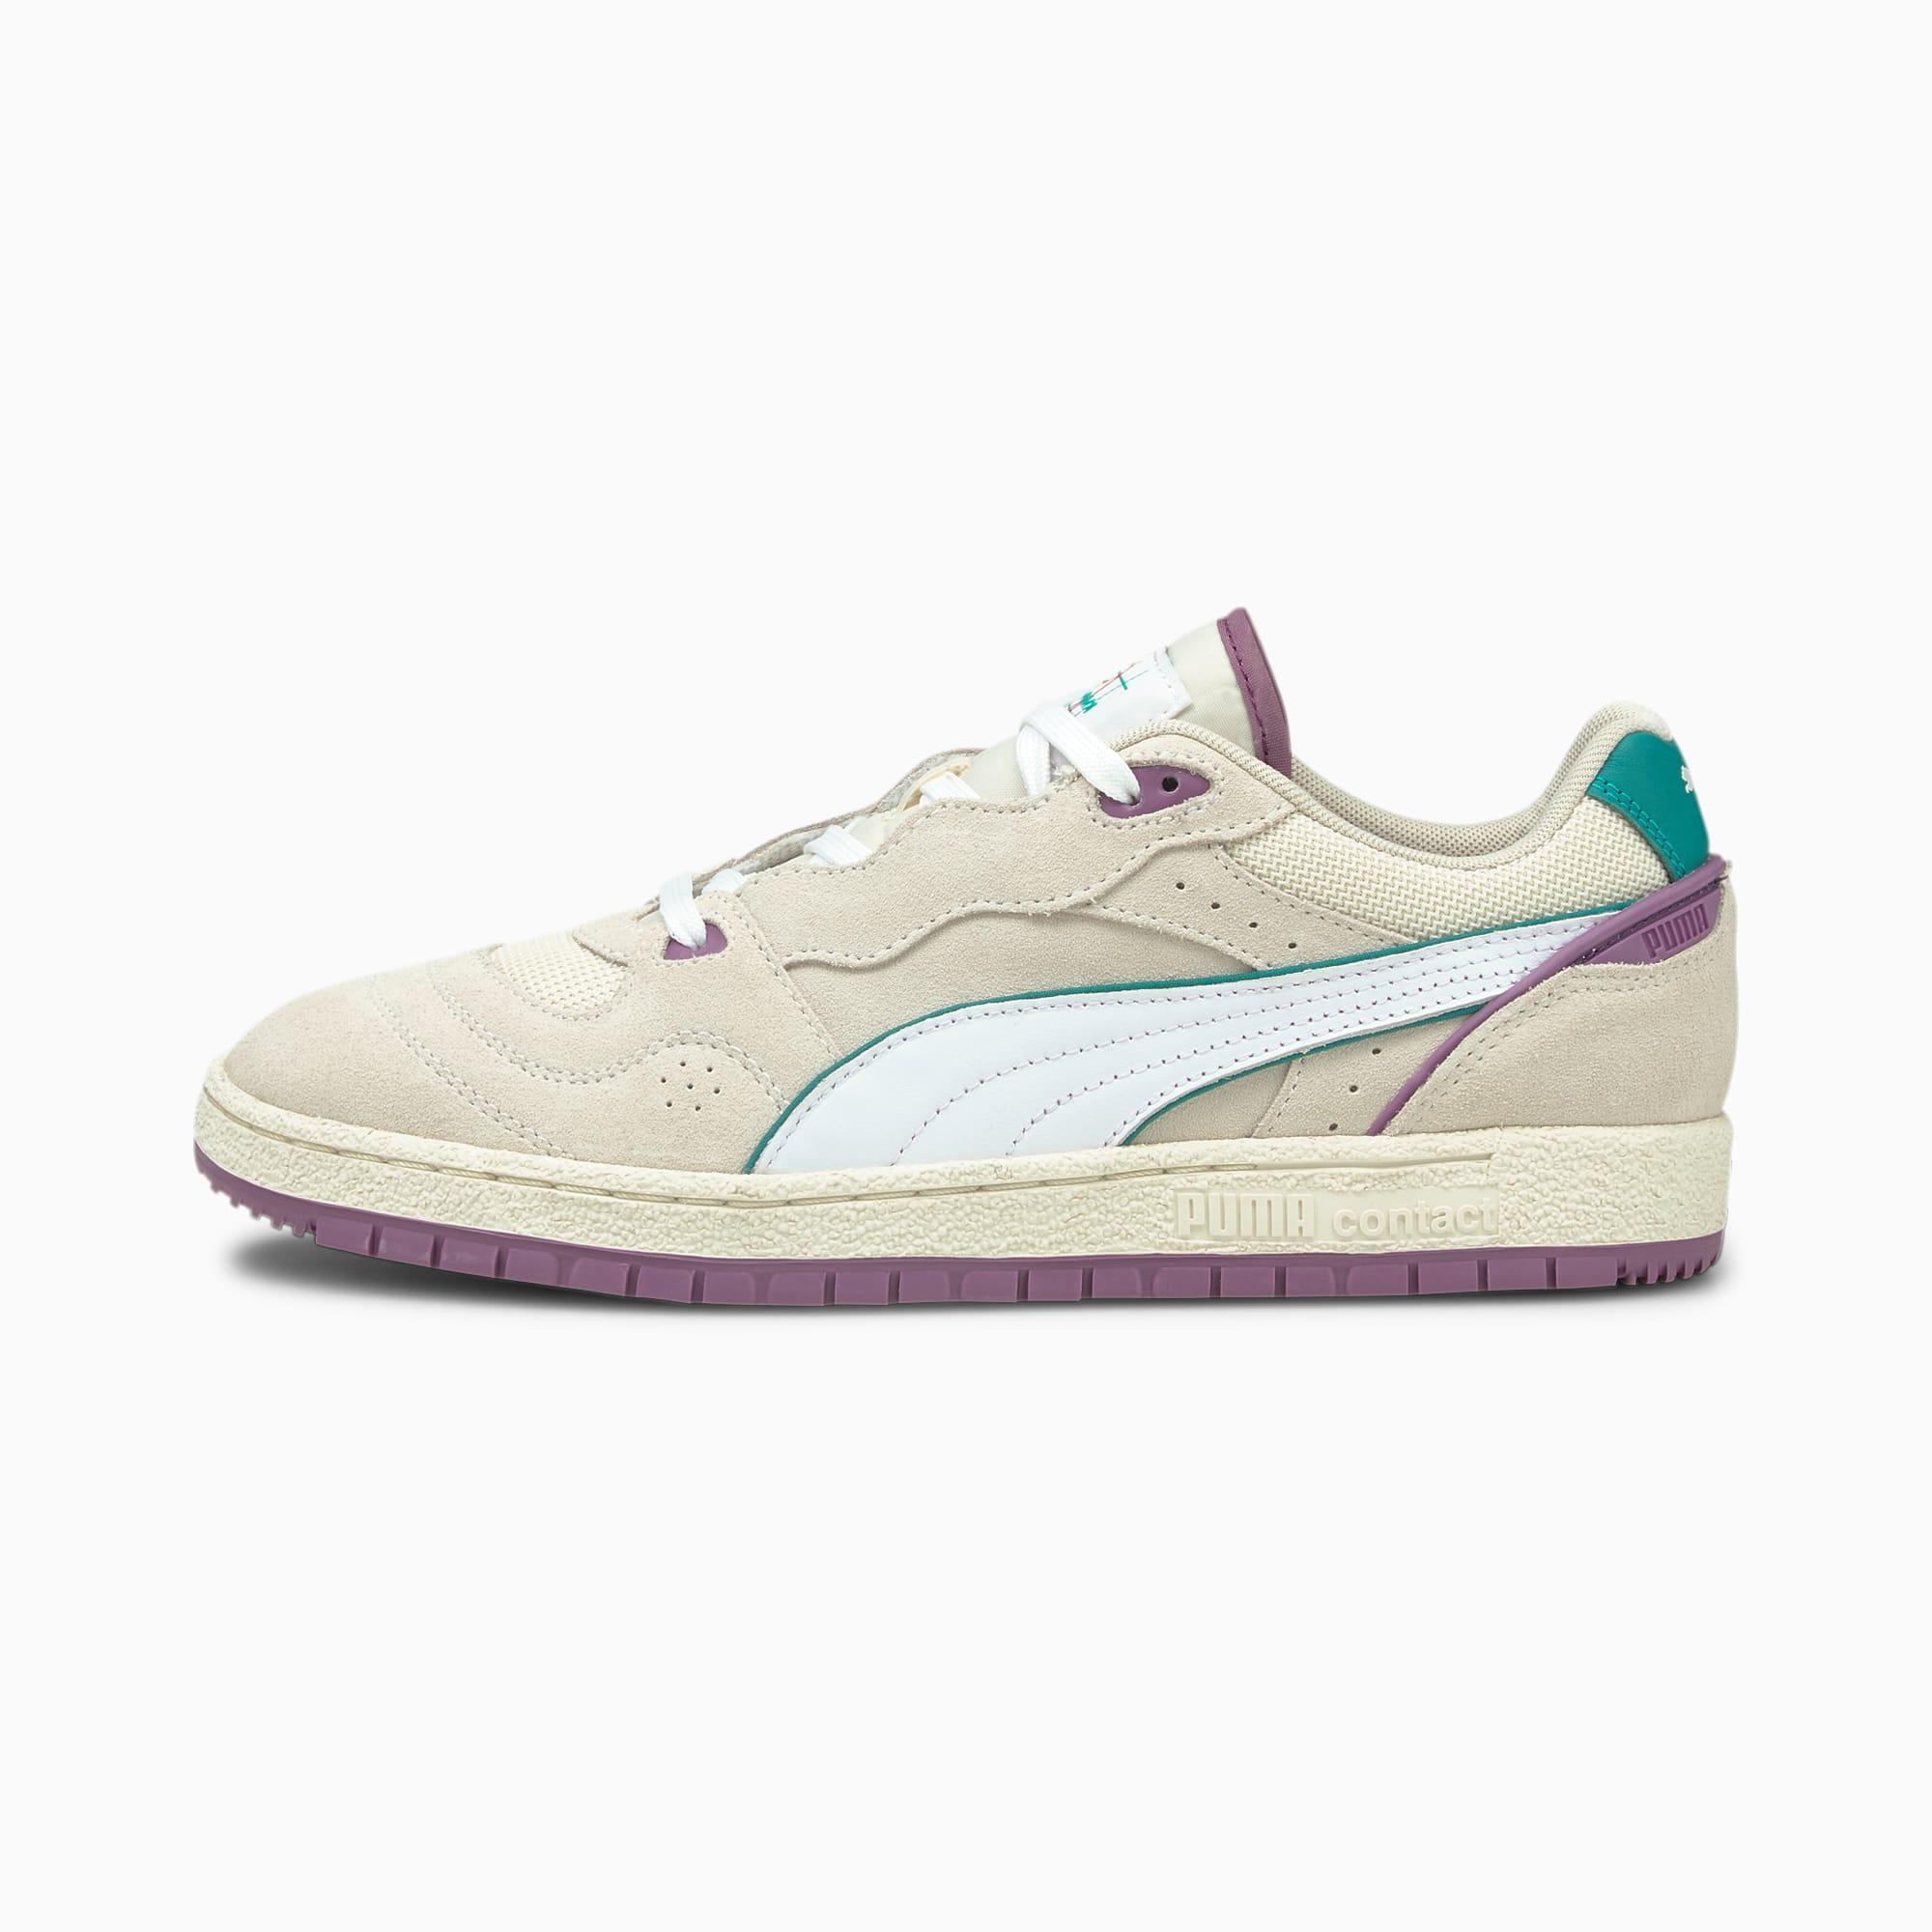 PUMA x PUMA Ralph Sampson 70 Sneaker Schuhe   Mit Aucun   Weiß   Größe: 40.5